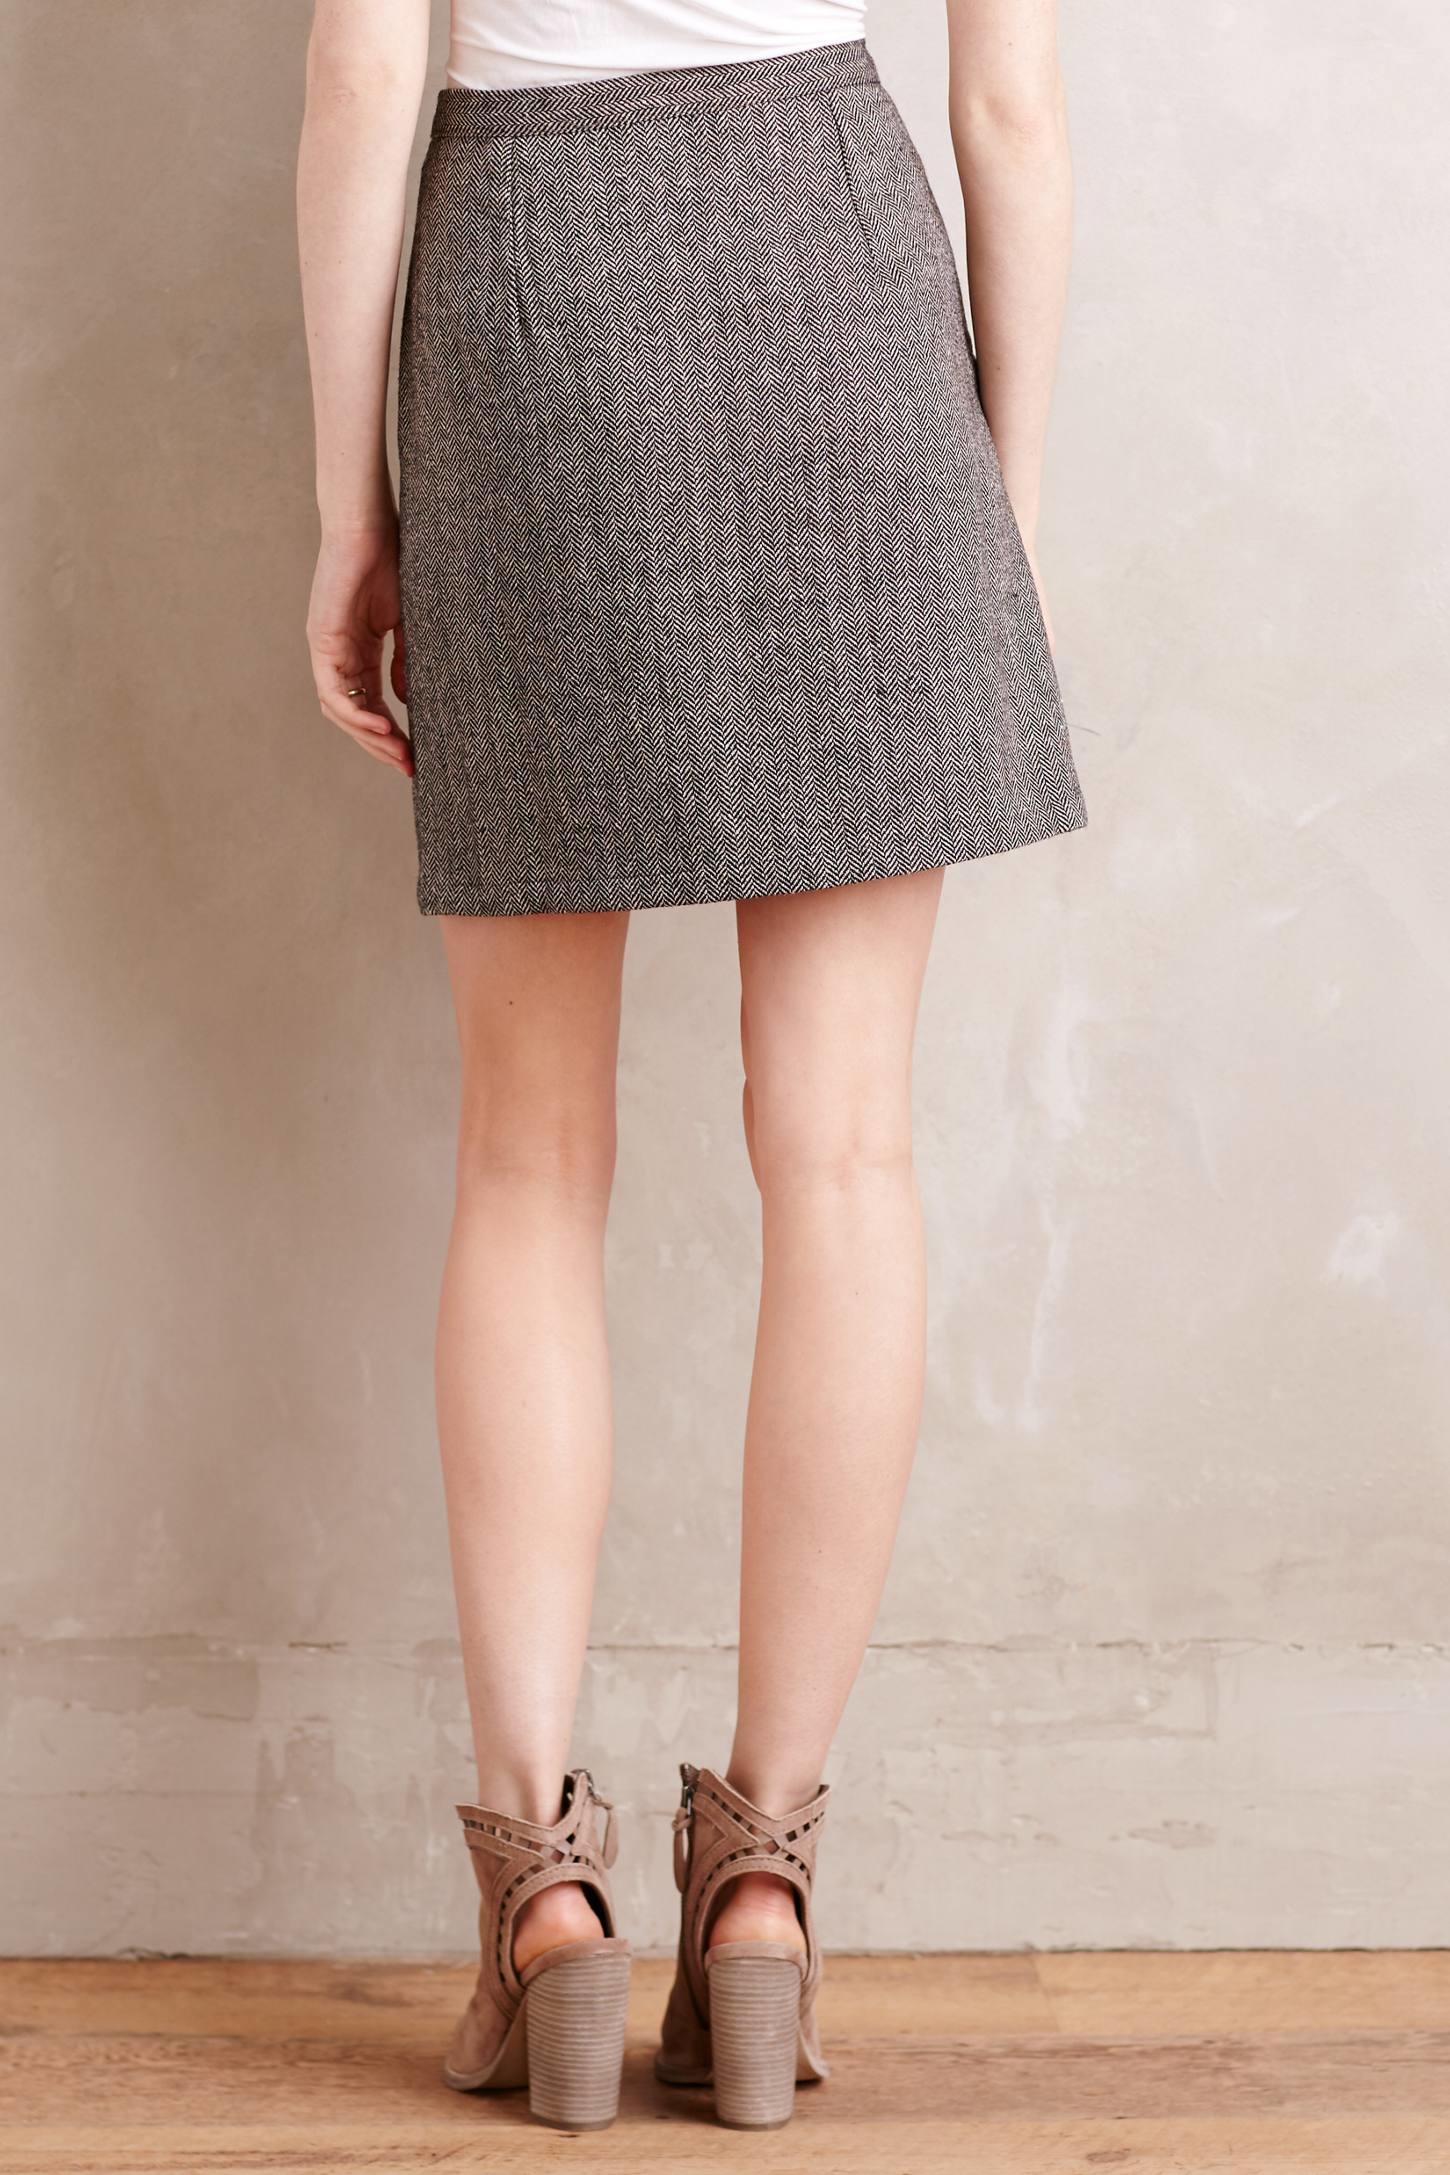 Hemant & nandita Embroidered Wool Mini Skirt in Gray   Lyst